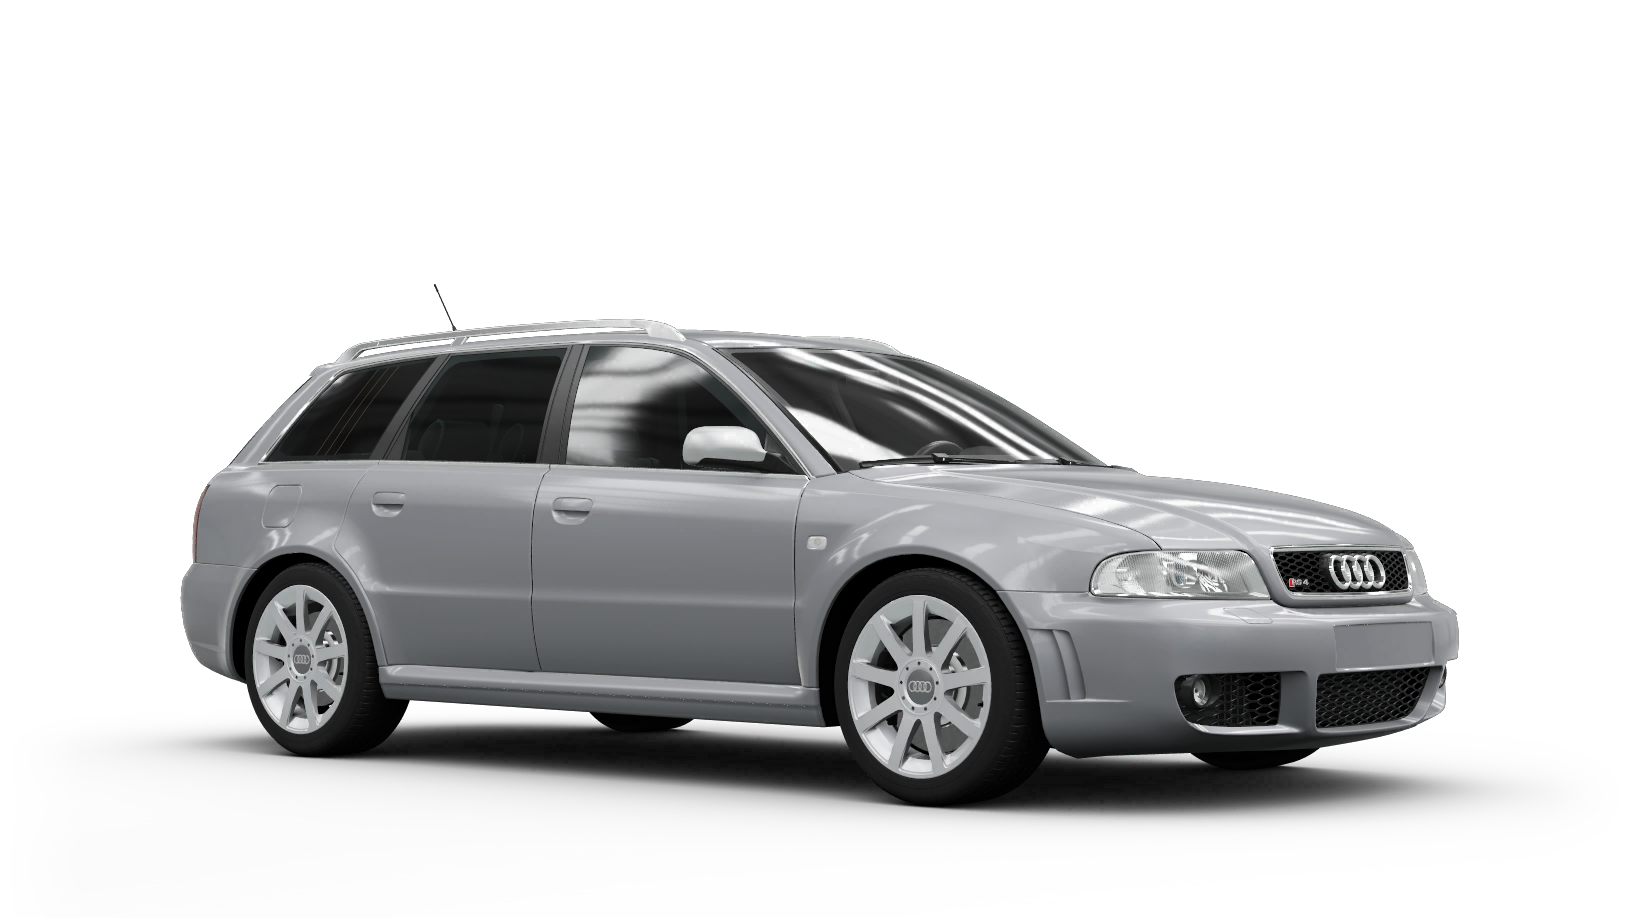 Audi RS 4 Avant (2001)